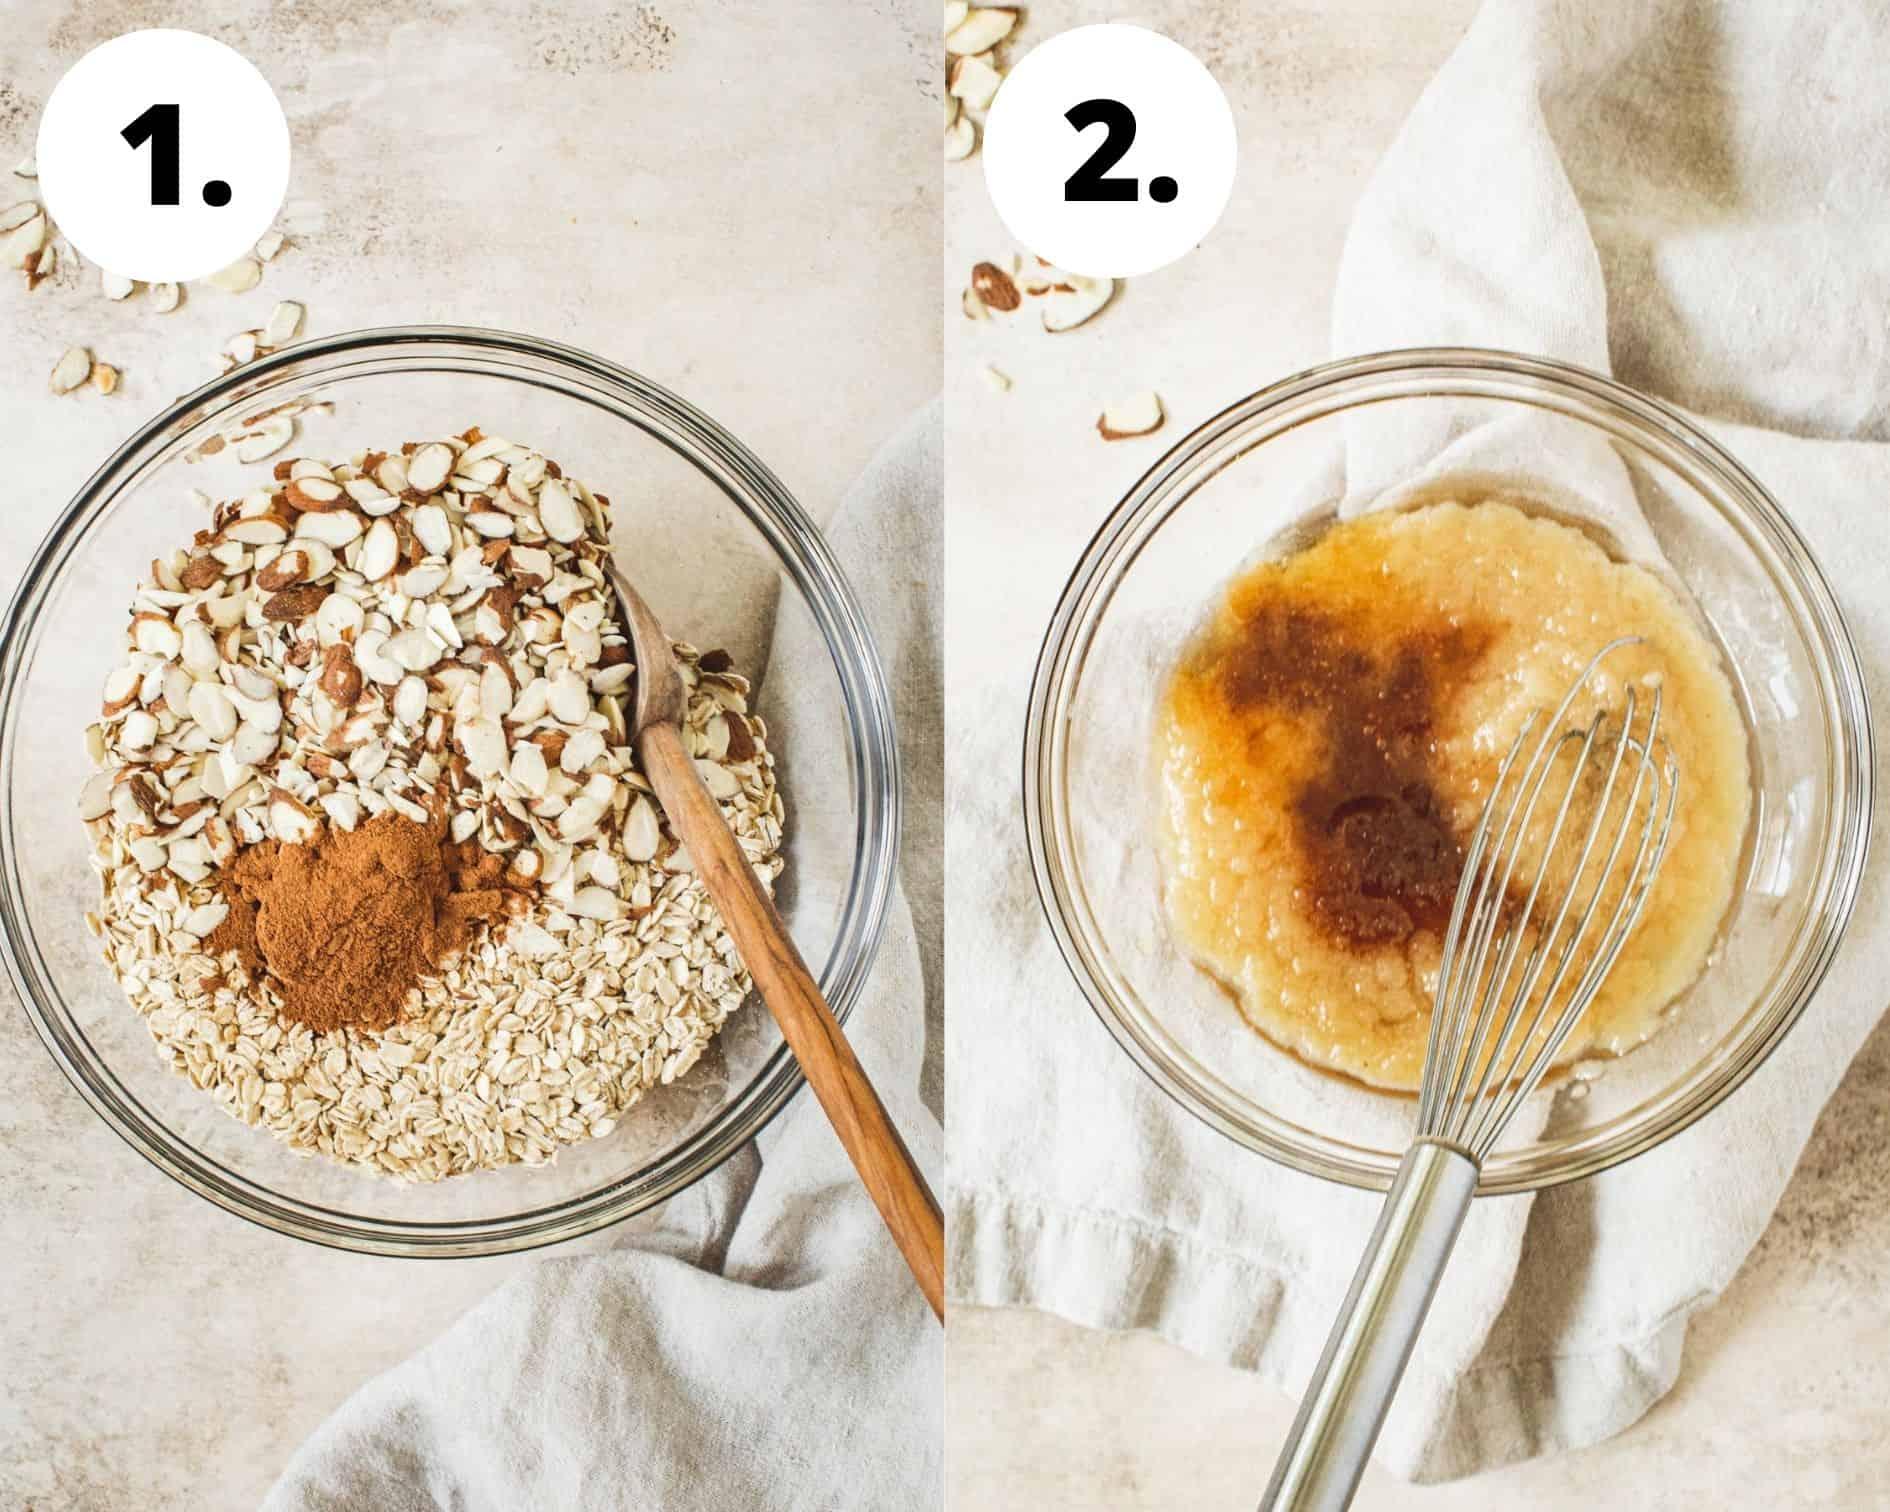 Process steps 1 and 2 for making honey vanilla granola.